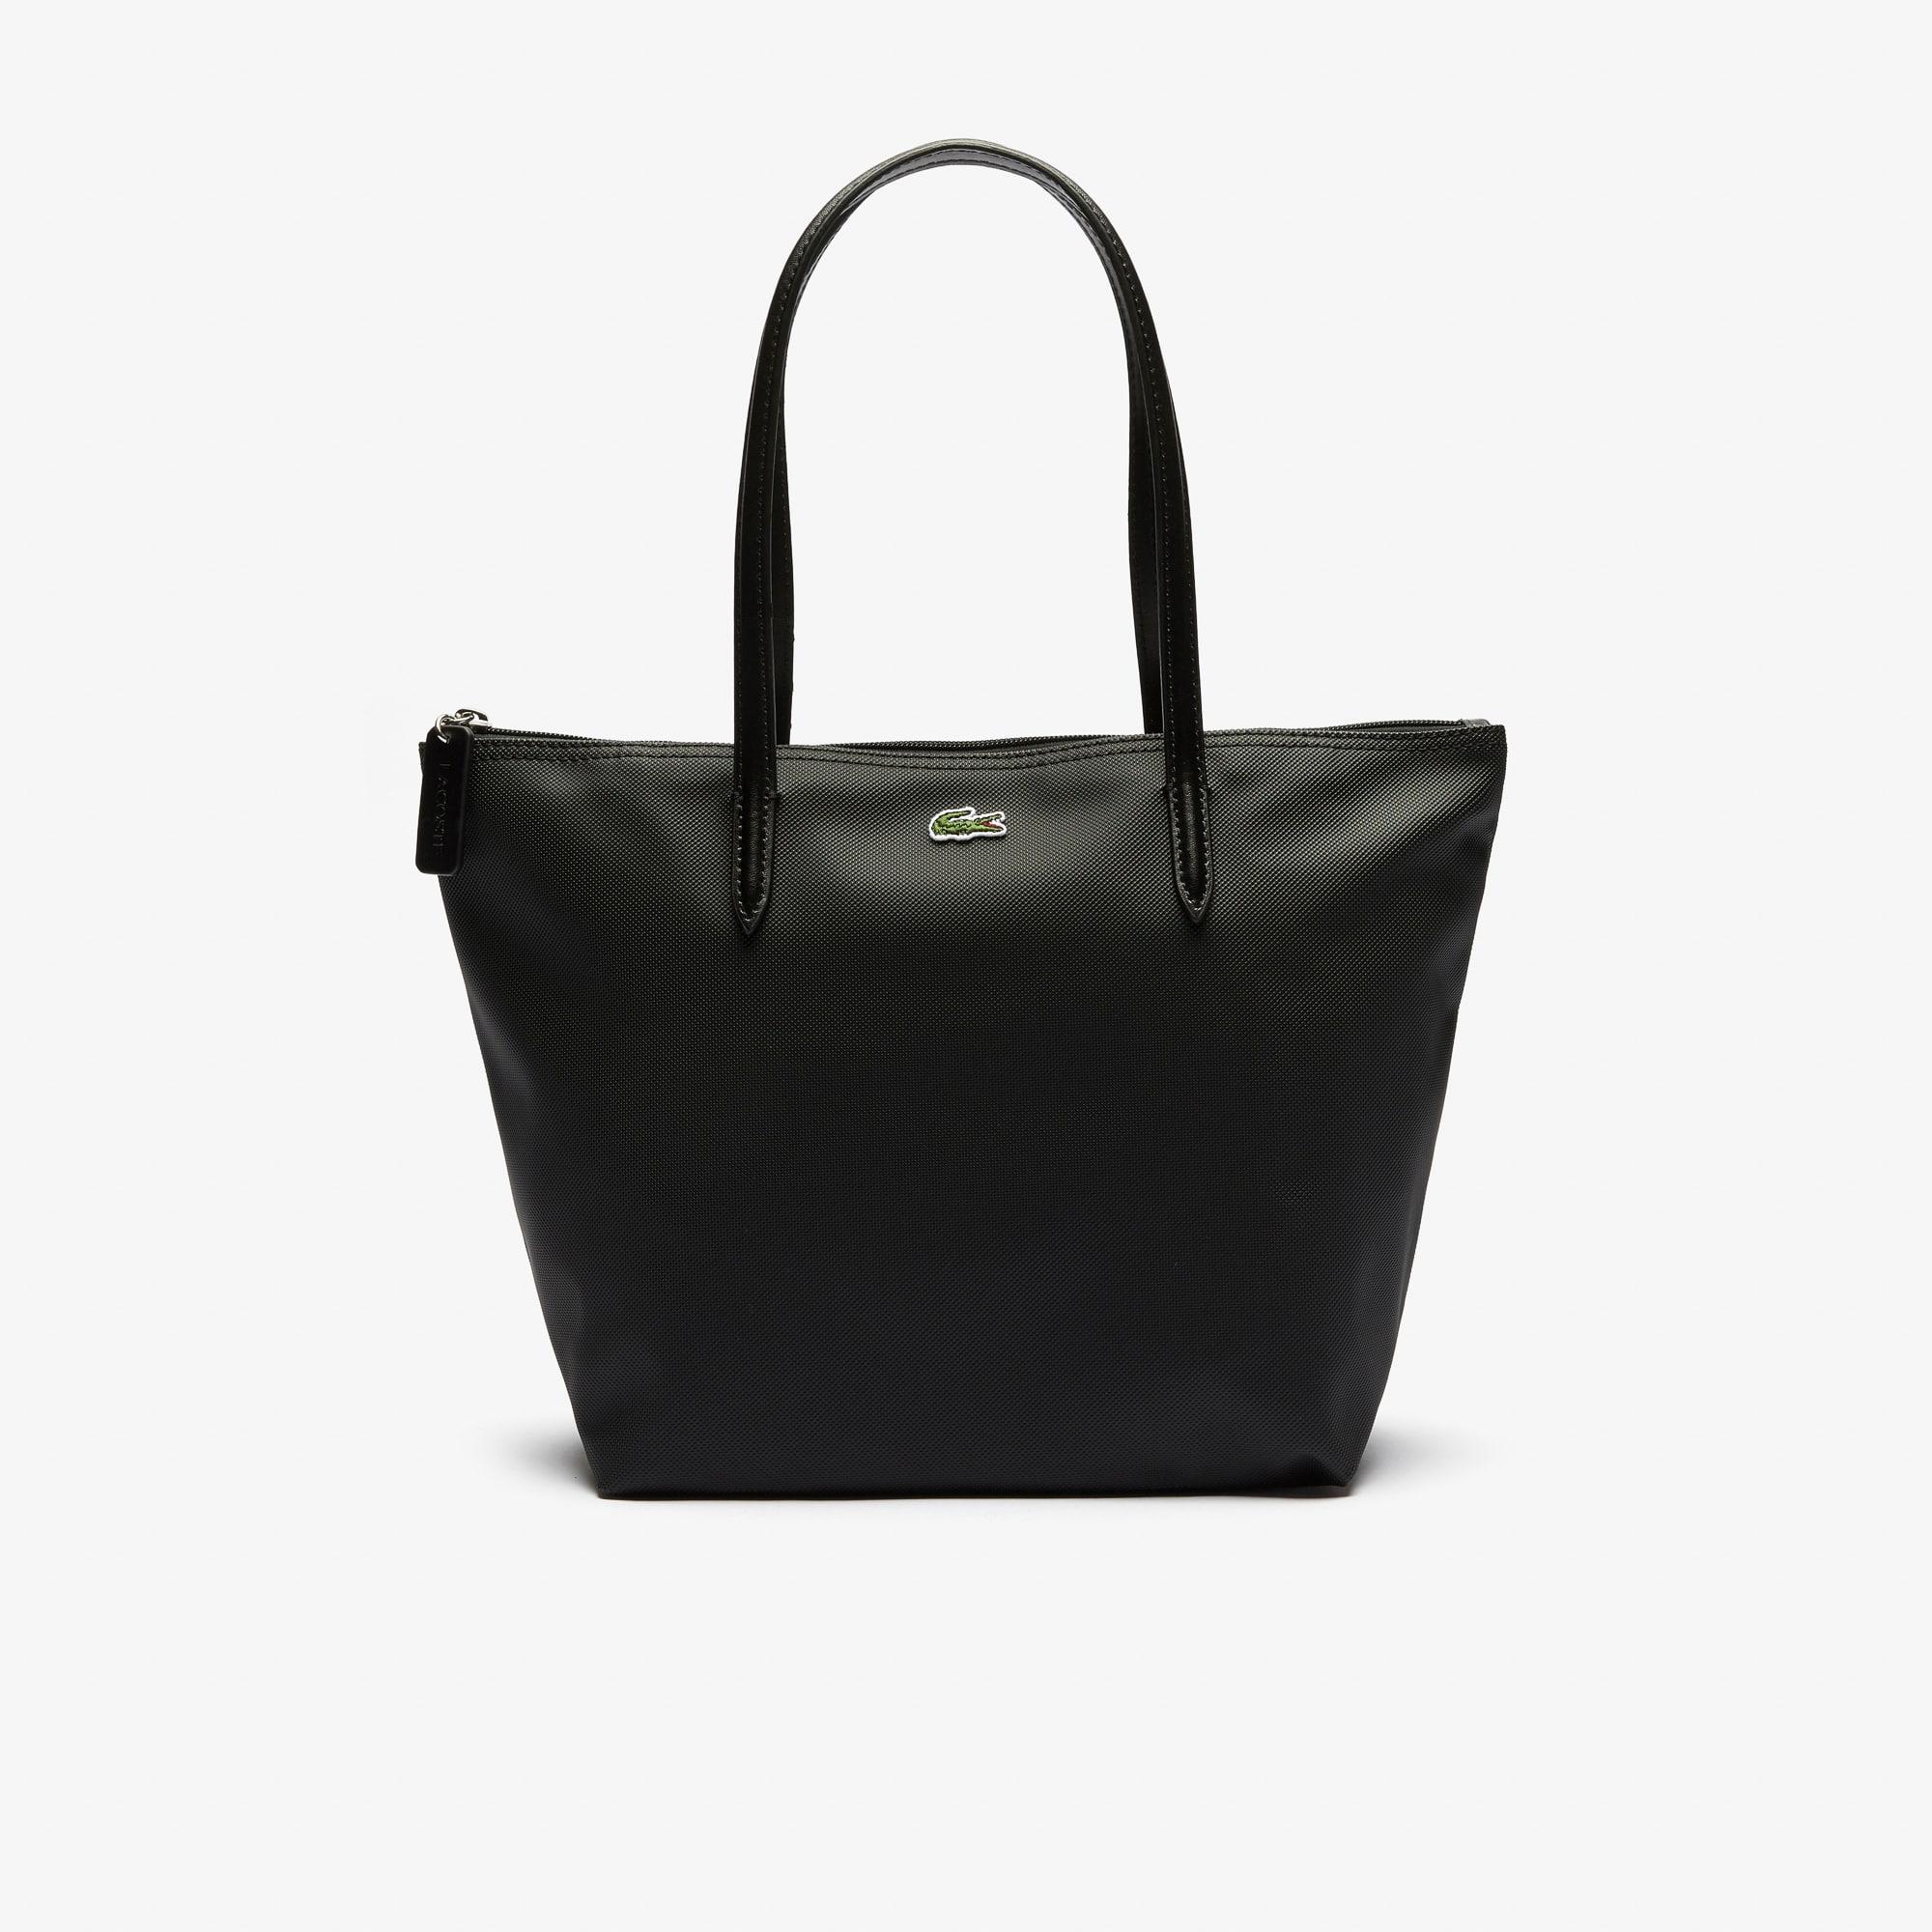 dfbf126903 Women s L.12.12 Small Tote Bag